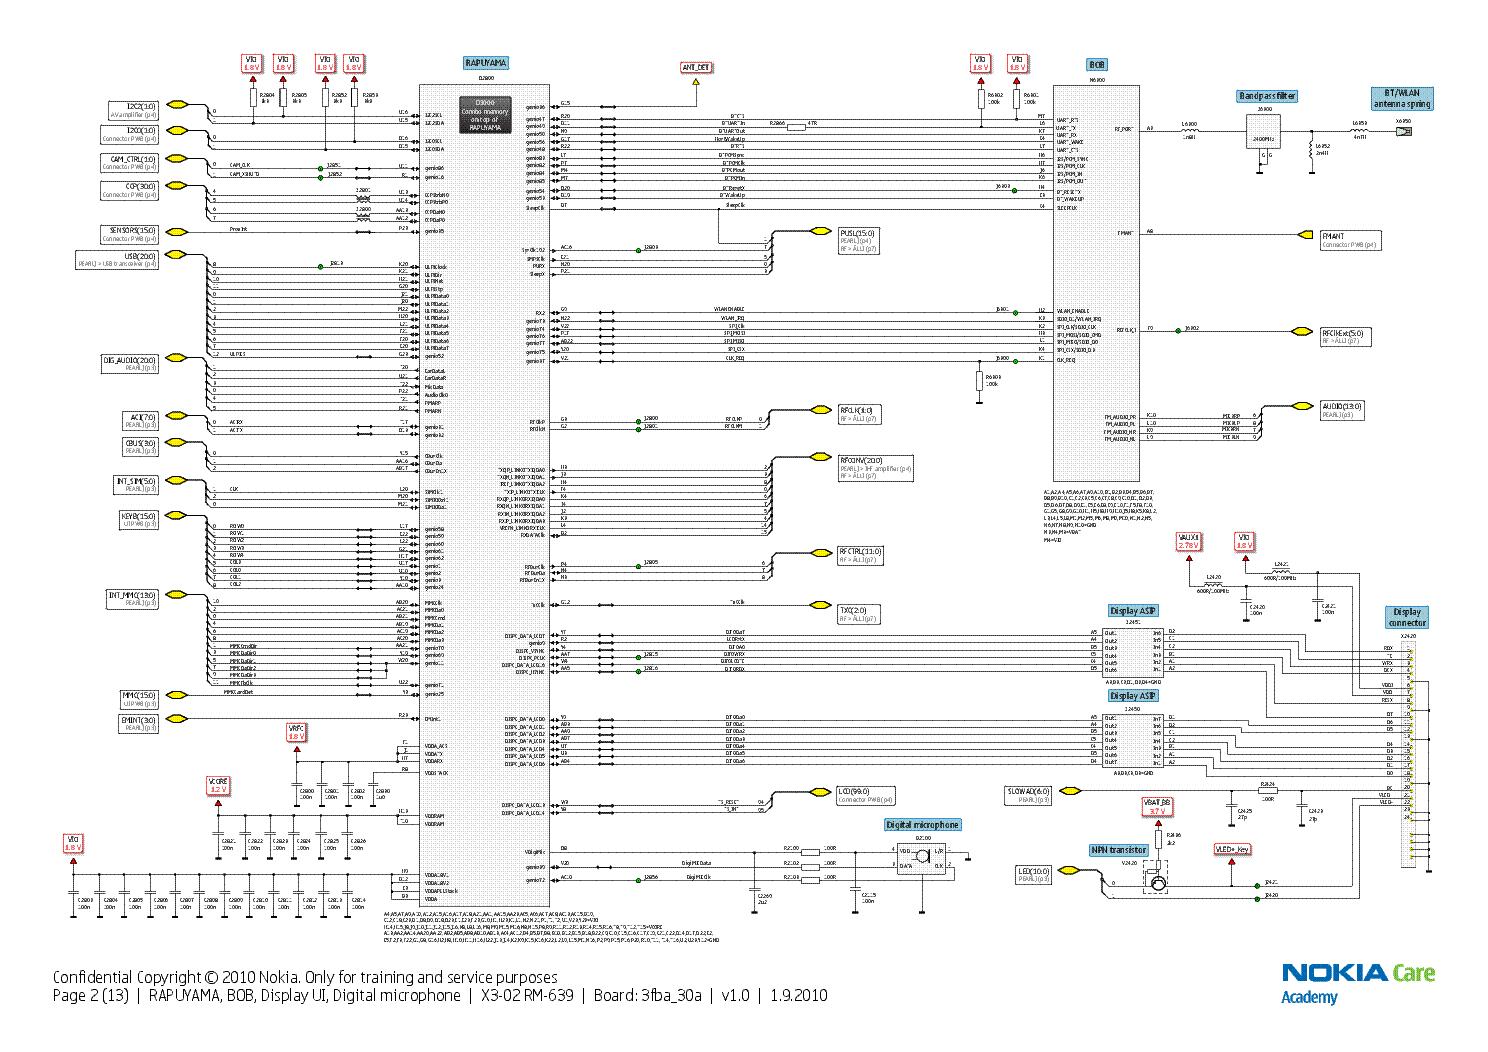 Nokia x3-02 manuals.